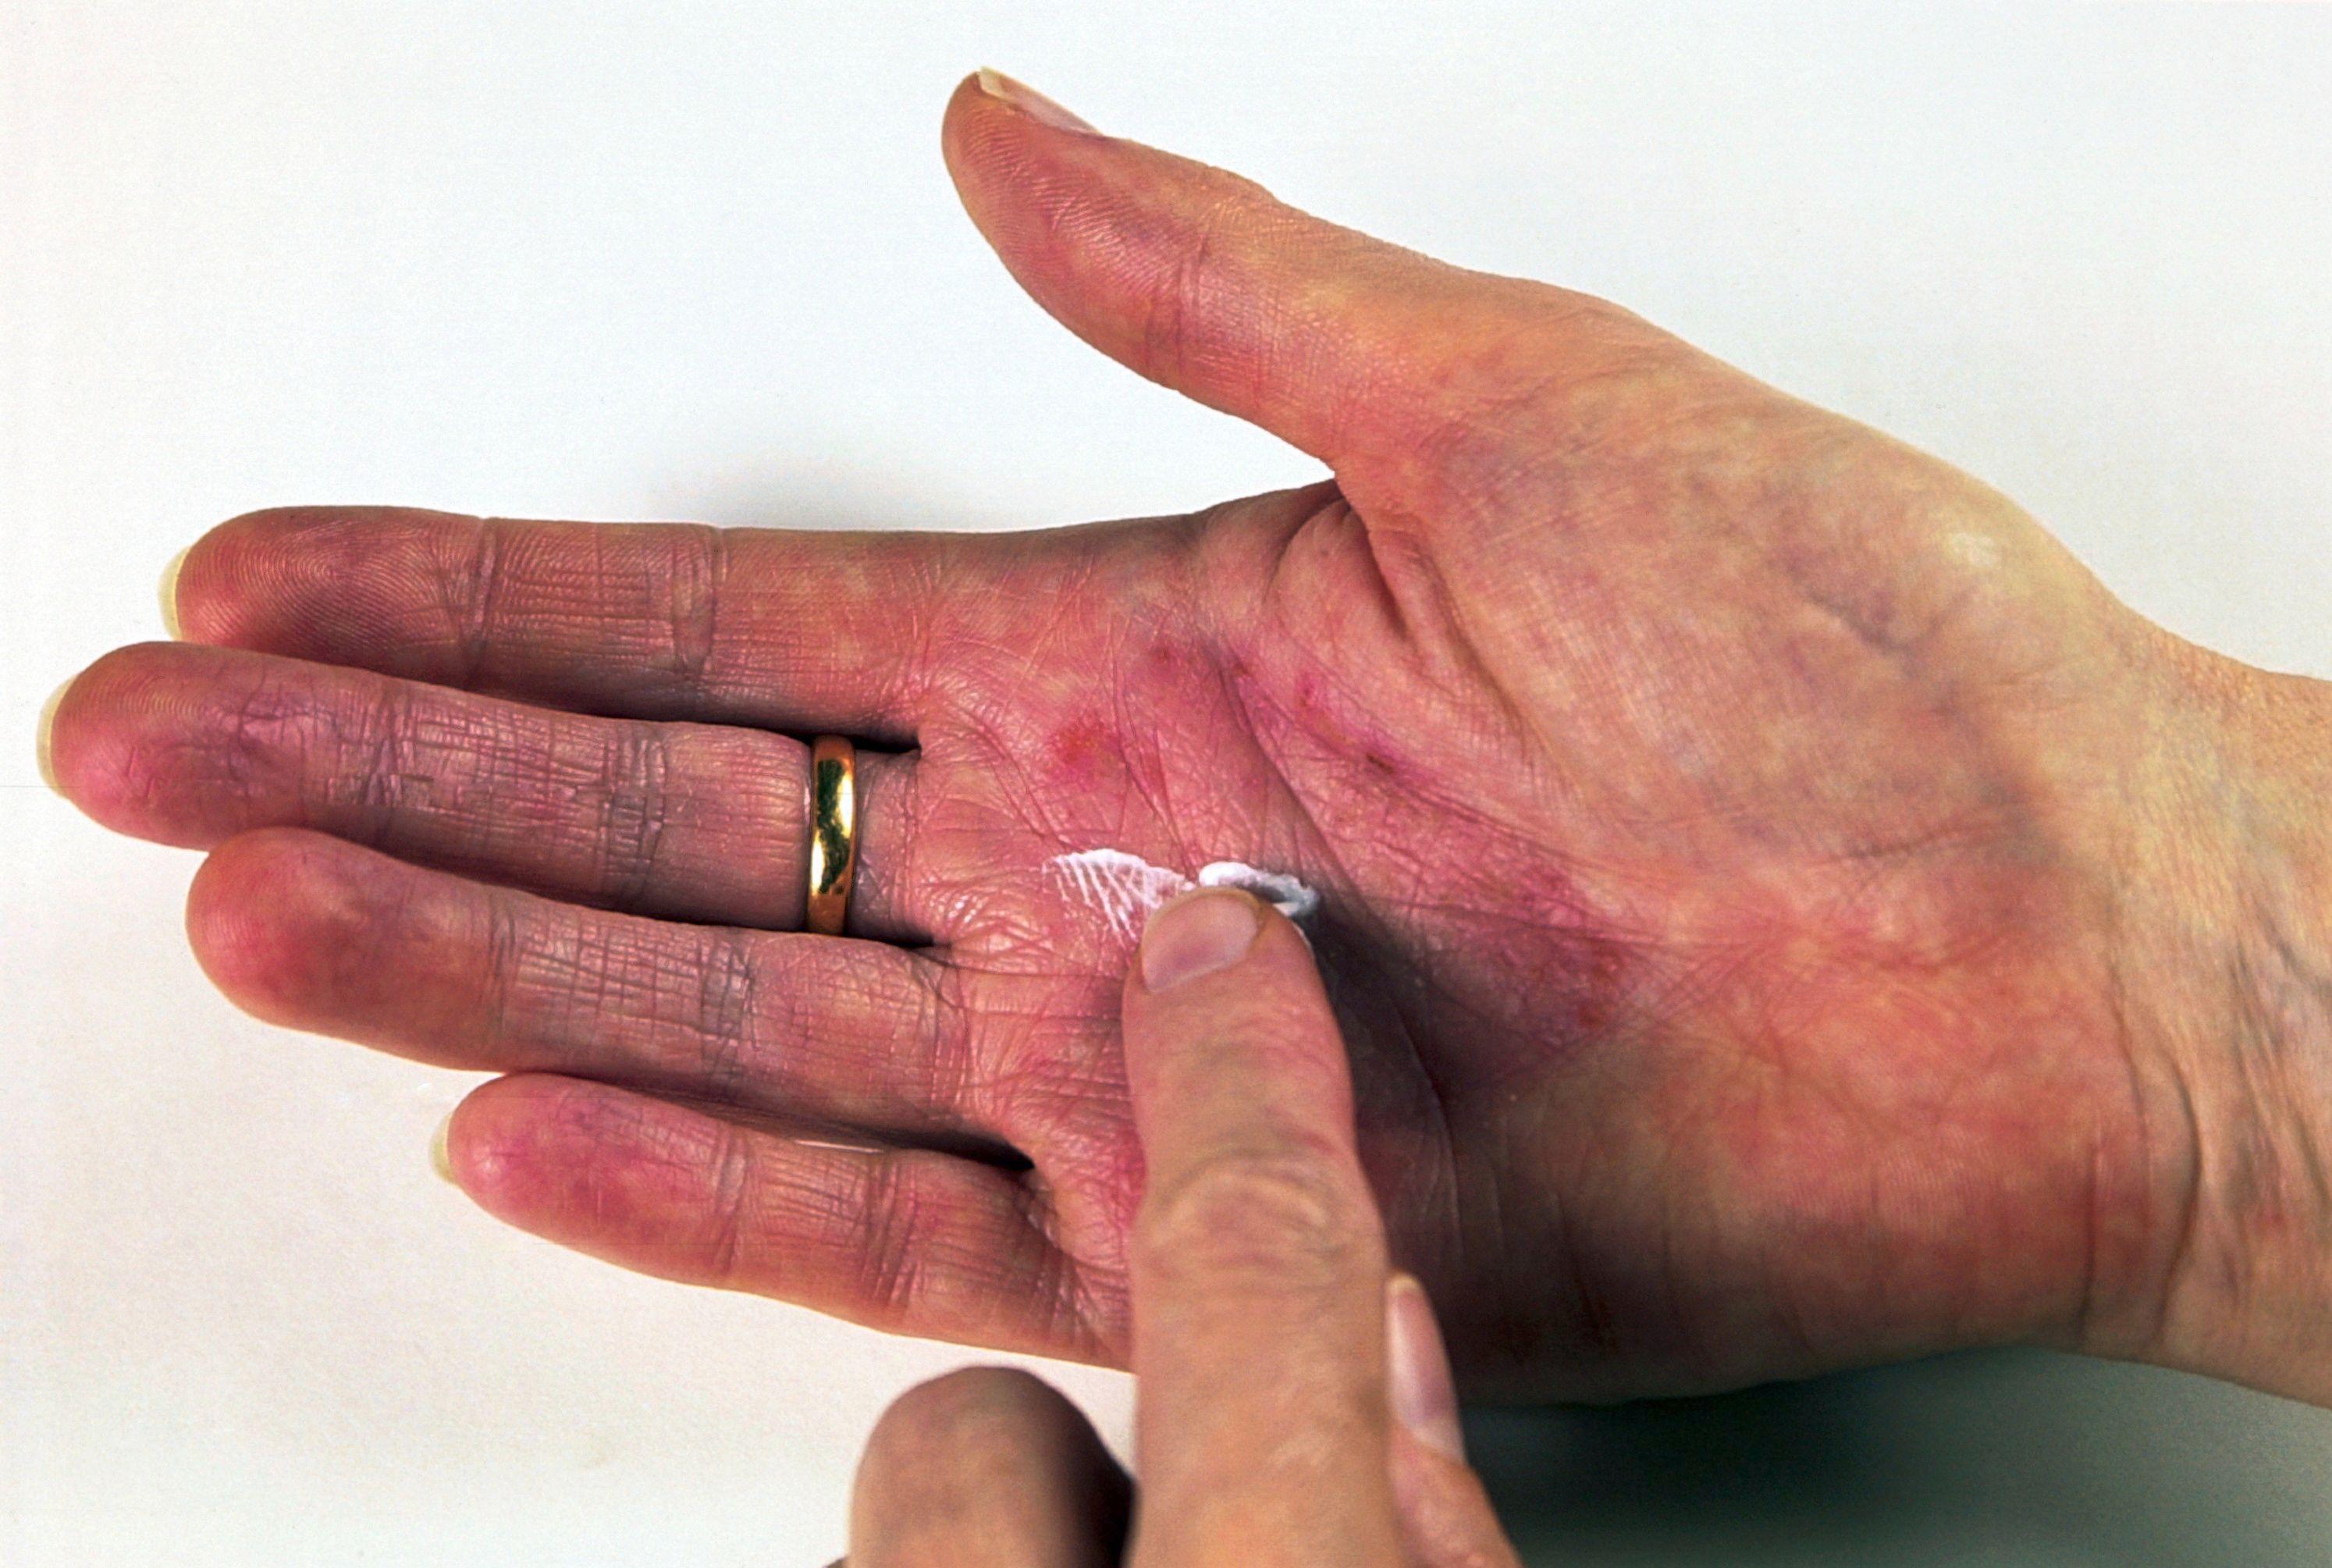 Applying hydrocortisone cream to eczema | Wellcome Collection